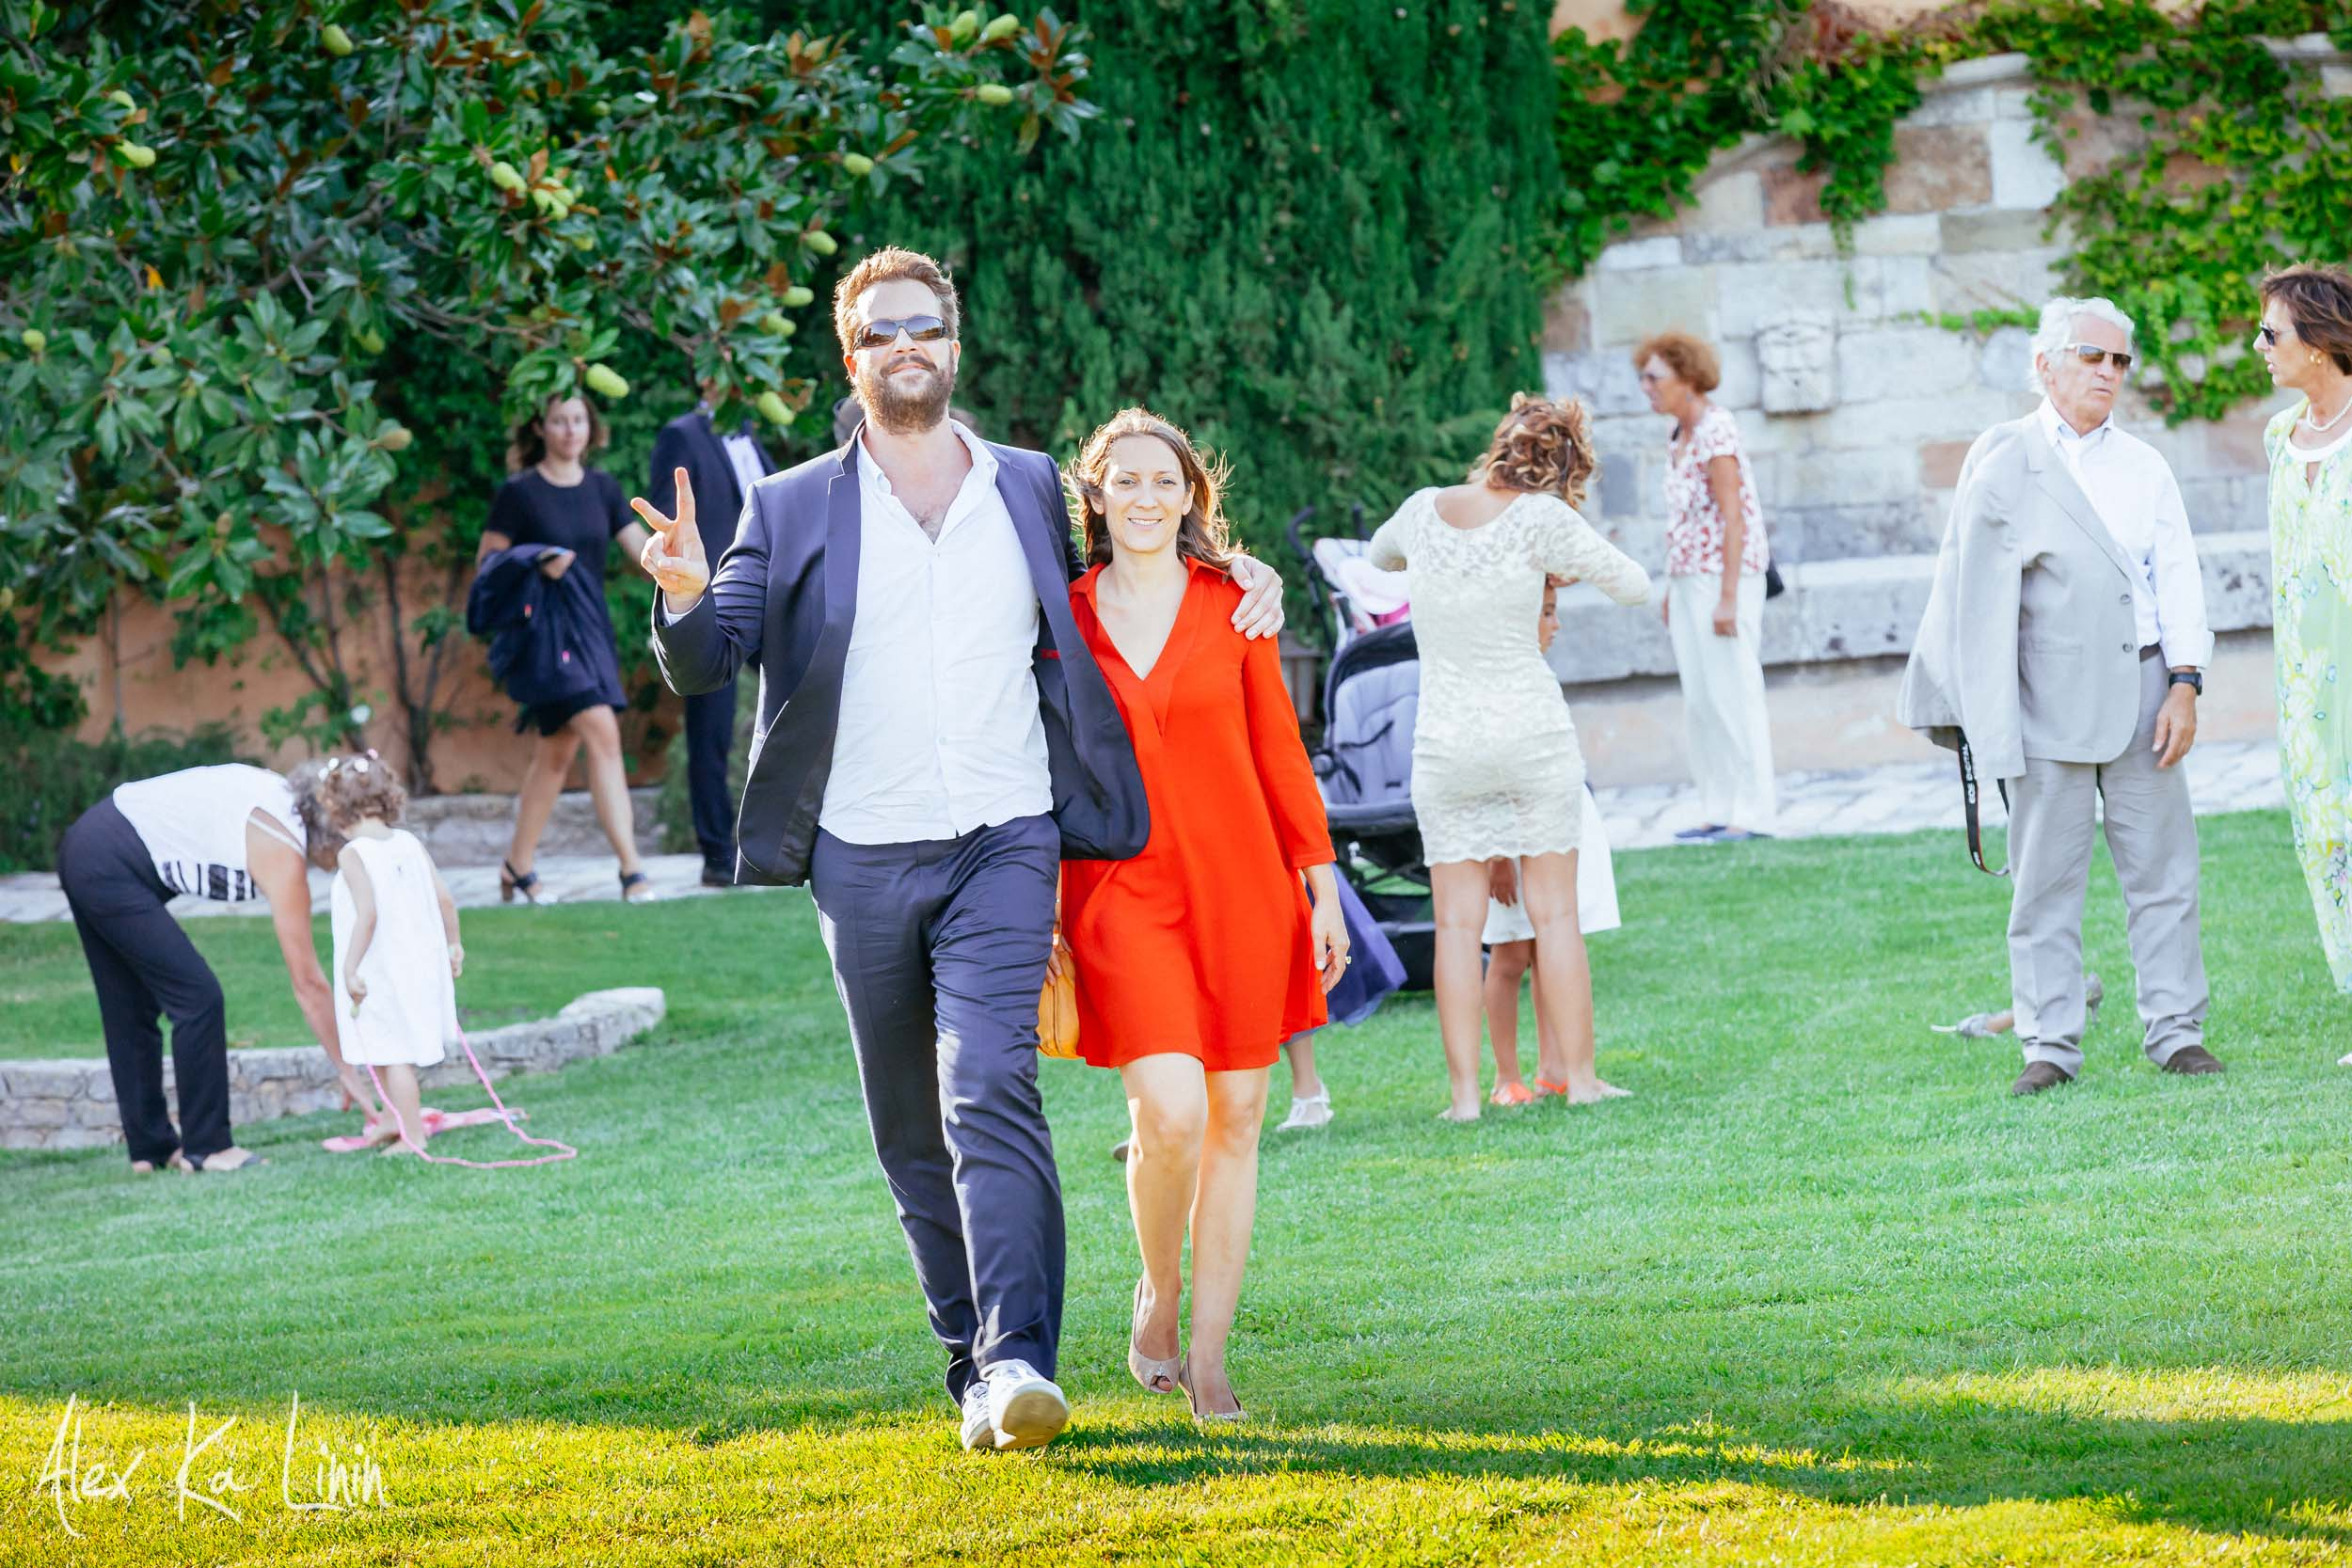 AlexKa_wedding_mariage_photographer-37.jpg